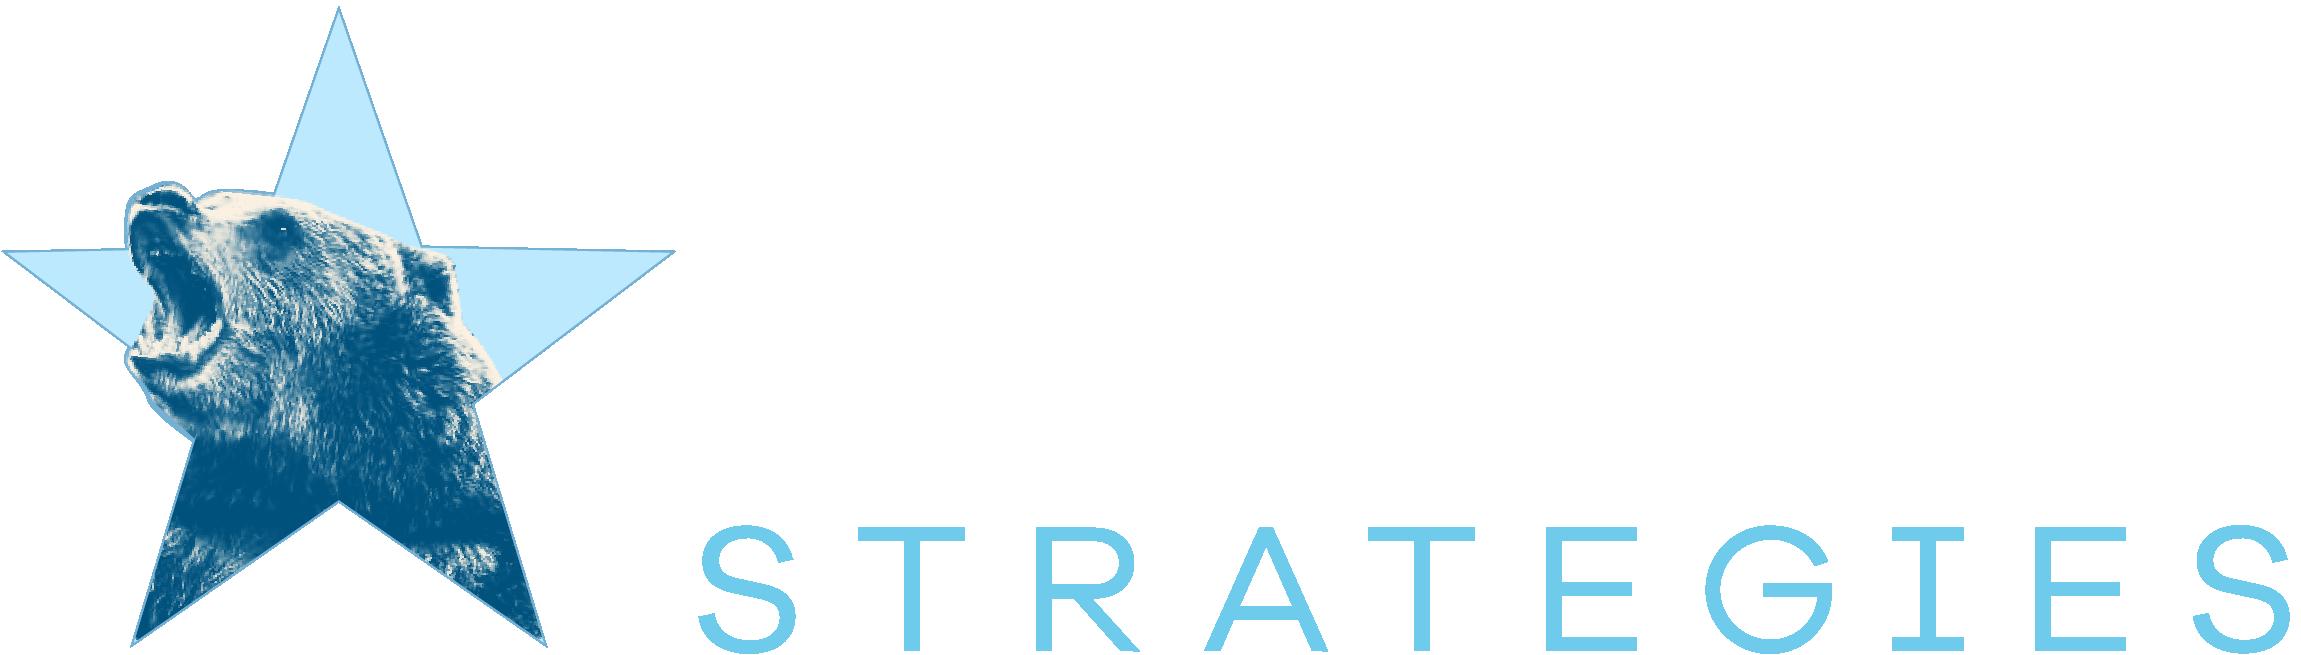 Bearstar Logo